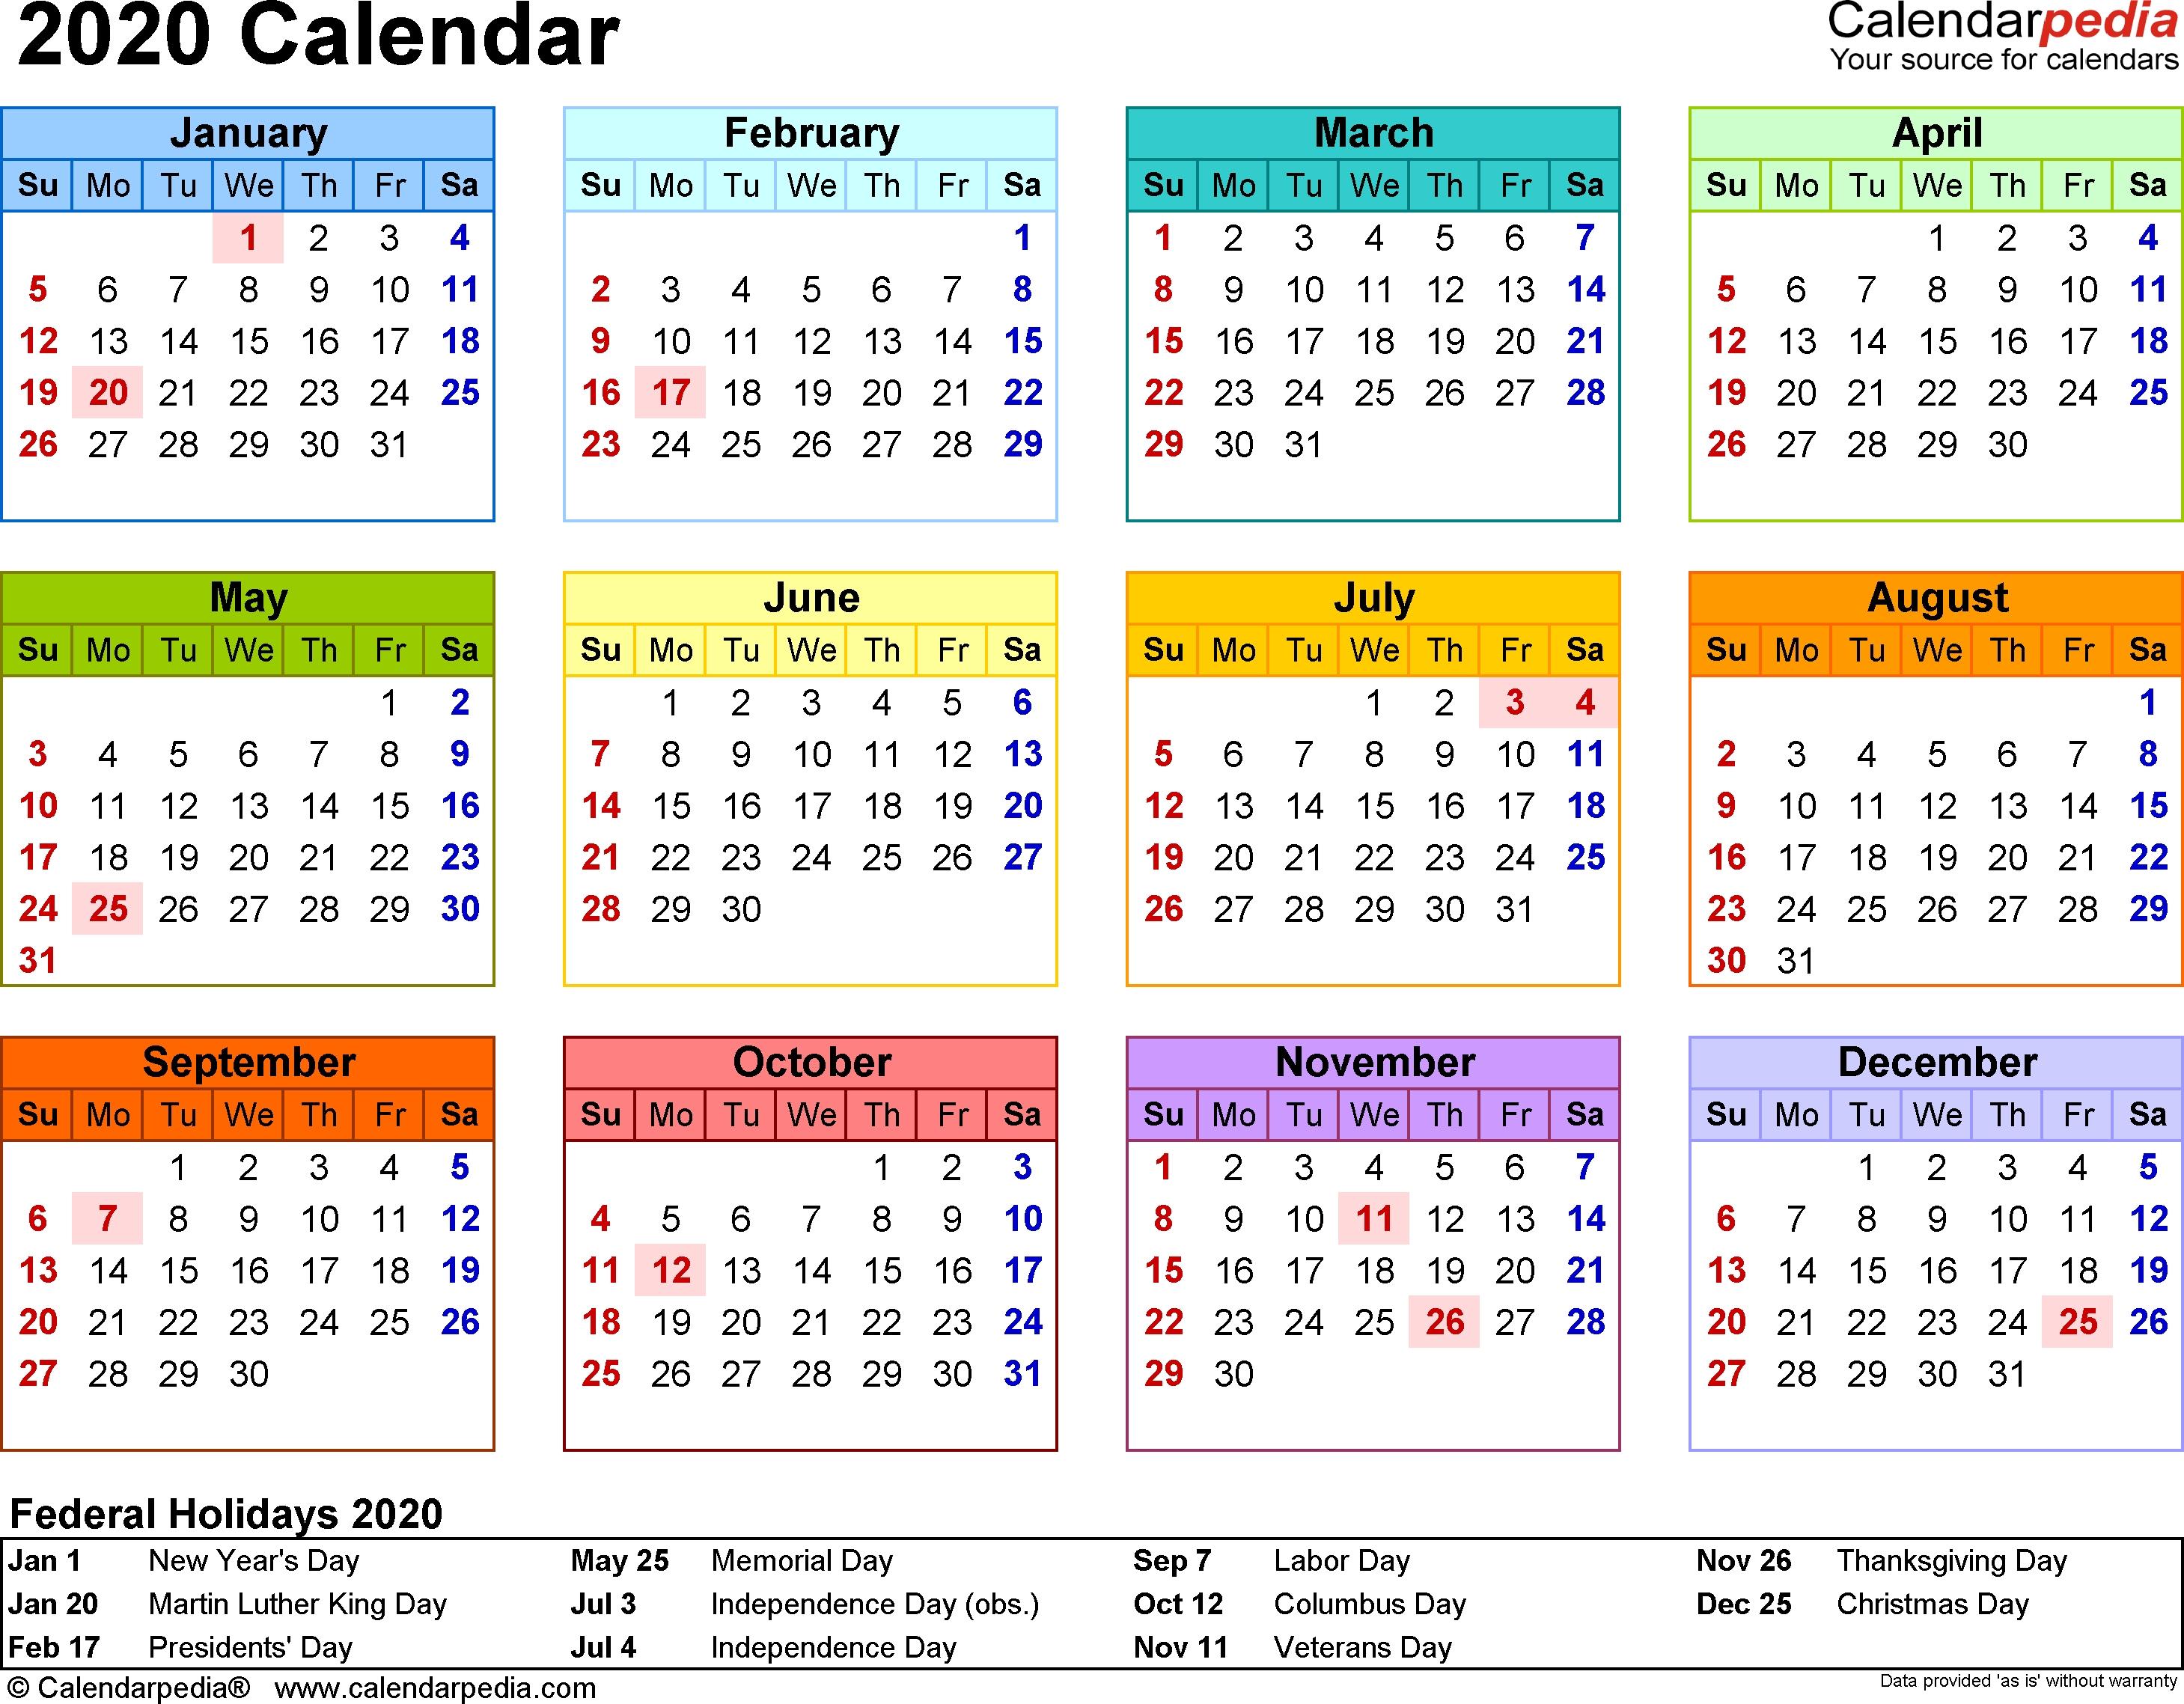 2020 Calendar - 18 Free Printable Word Calendar Templates-Microsoft Word 2020 Calendar Template